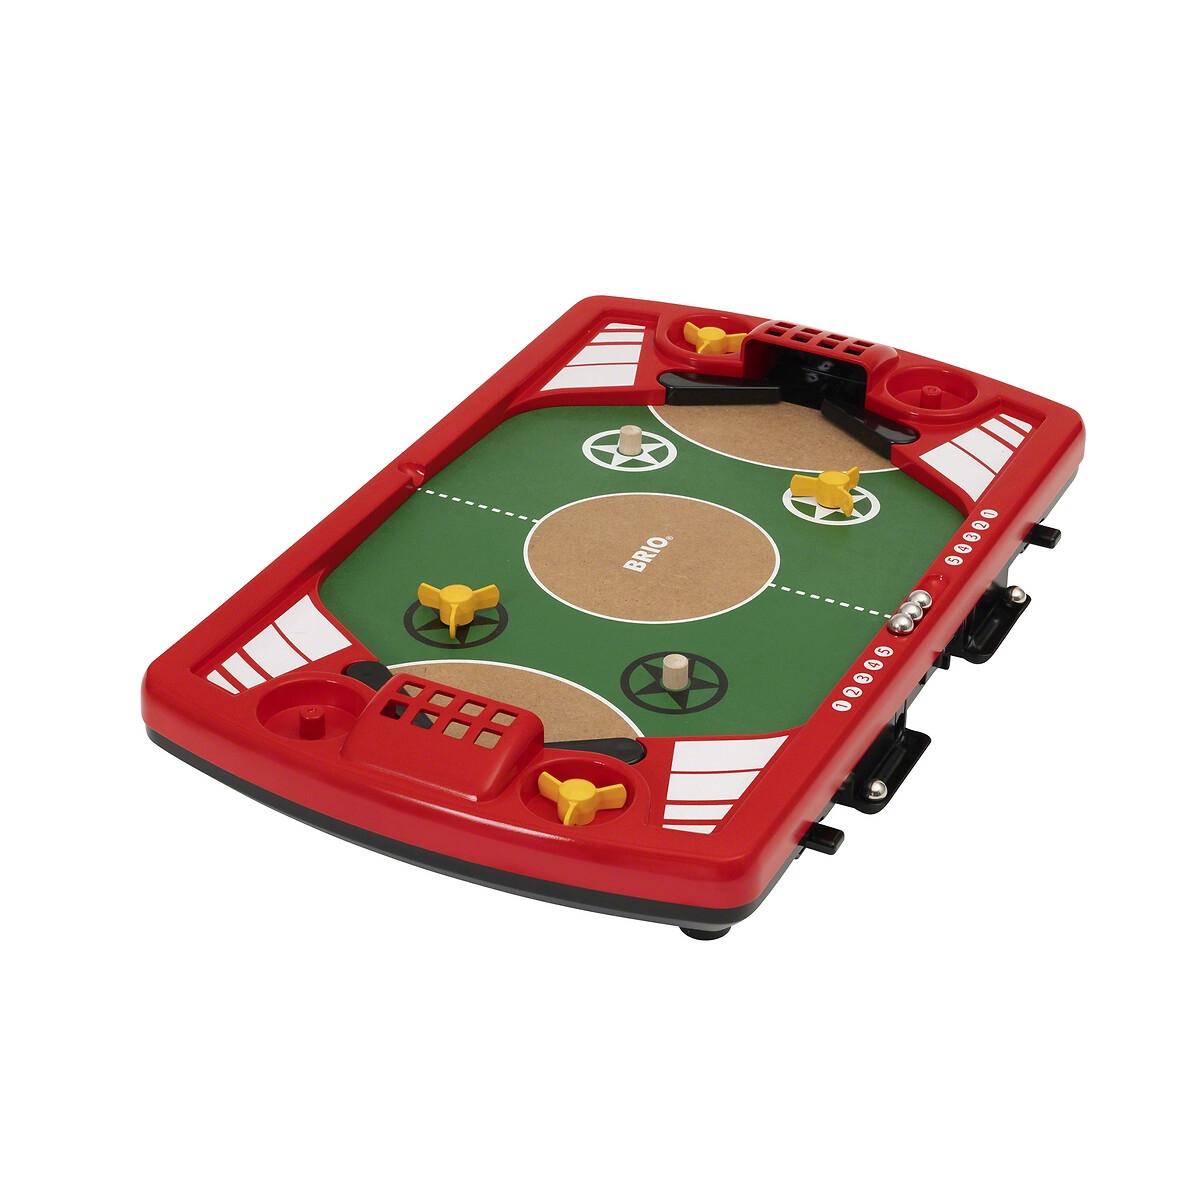 An image of Brio Pinball Challenge